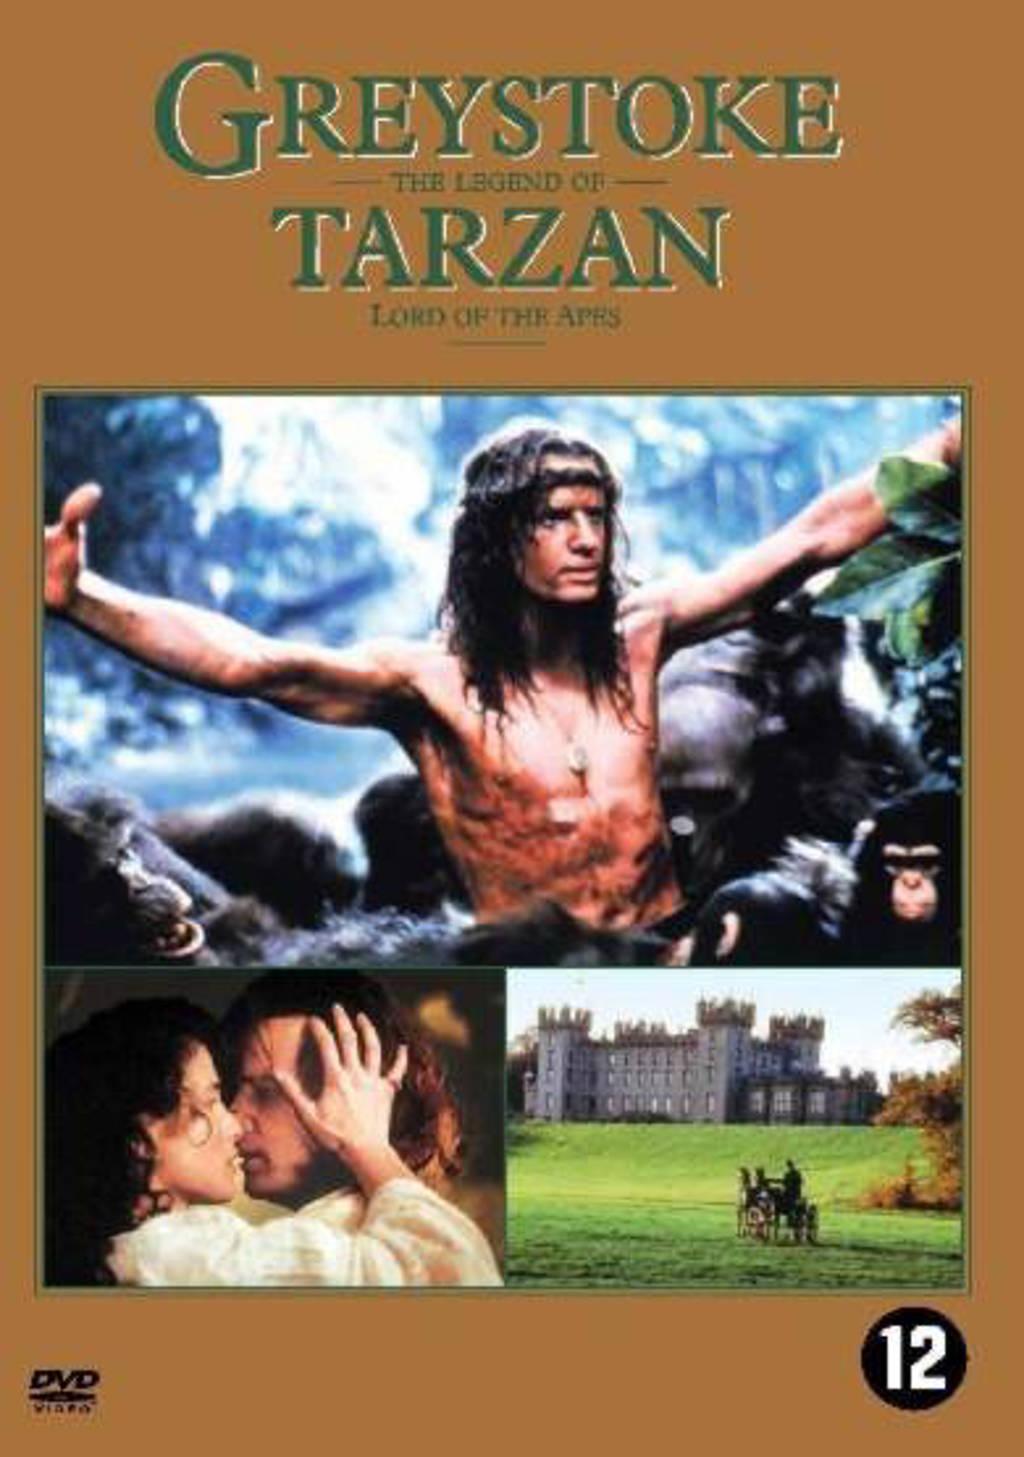 Greystoke- The legend of Tarzan (DVD)